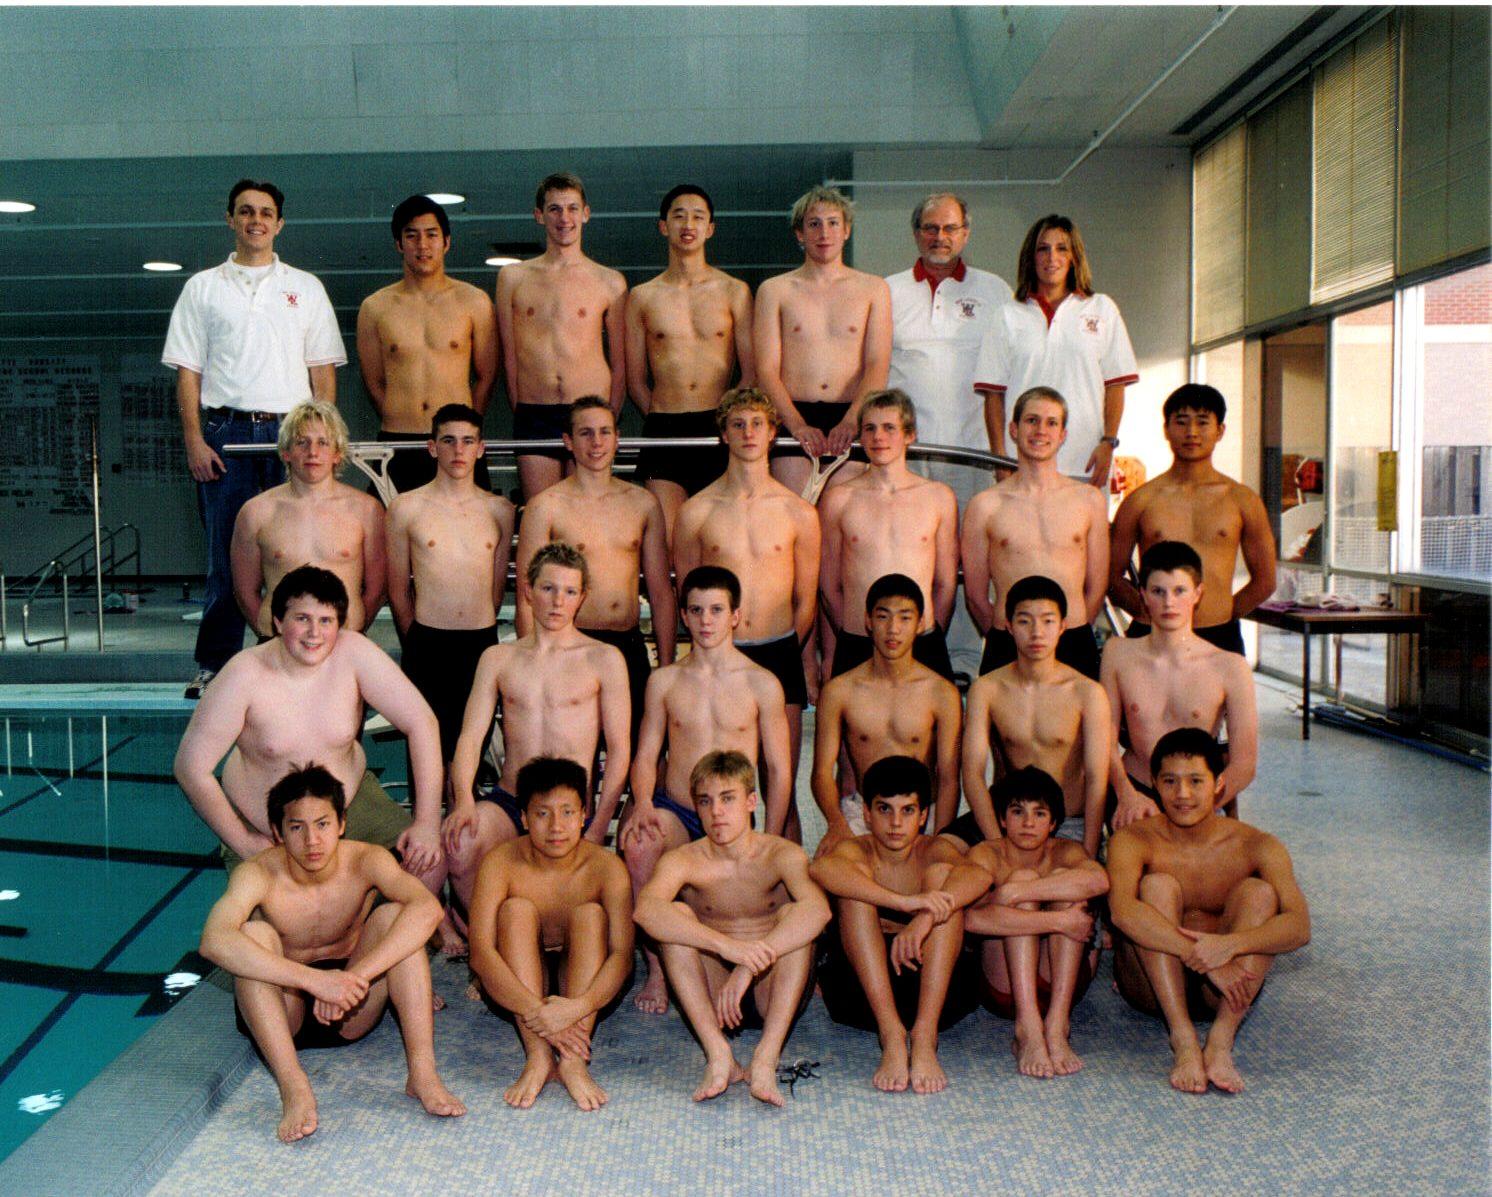 High school boys nude bum dick and jet